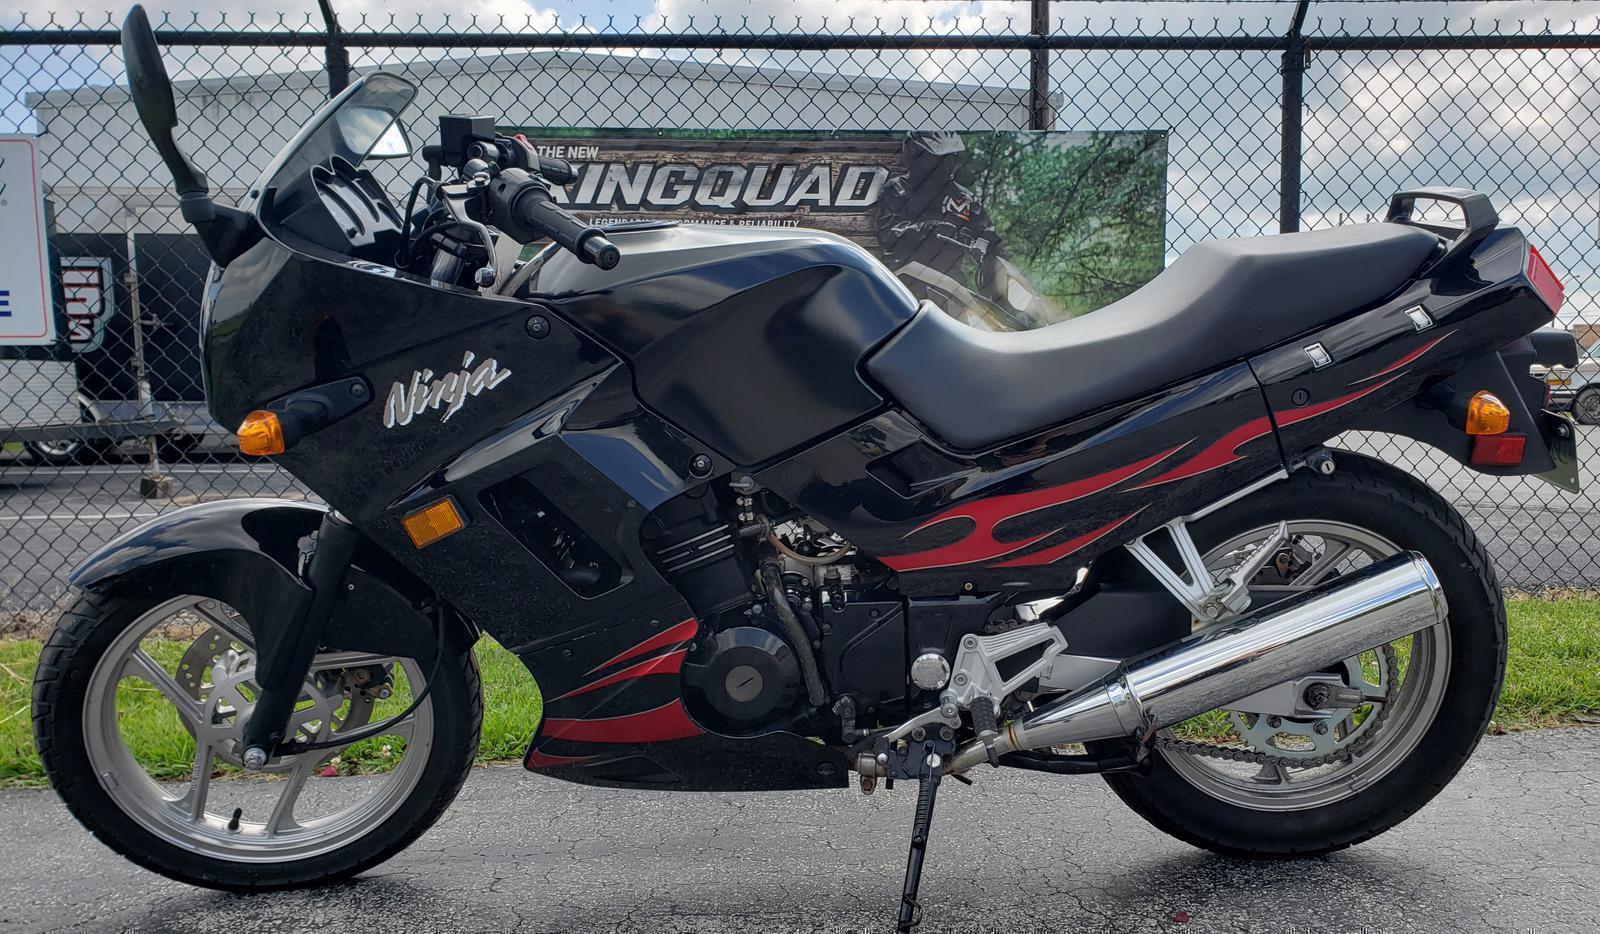 Marvelous 2007 Kawasaki Ninja 250R Theyellowbook Wood Chair Design Ideas Theyellowbookinfo